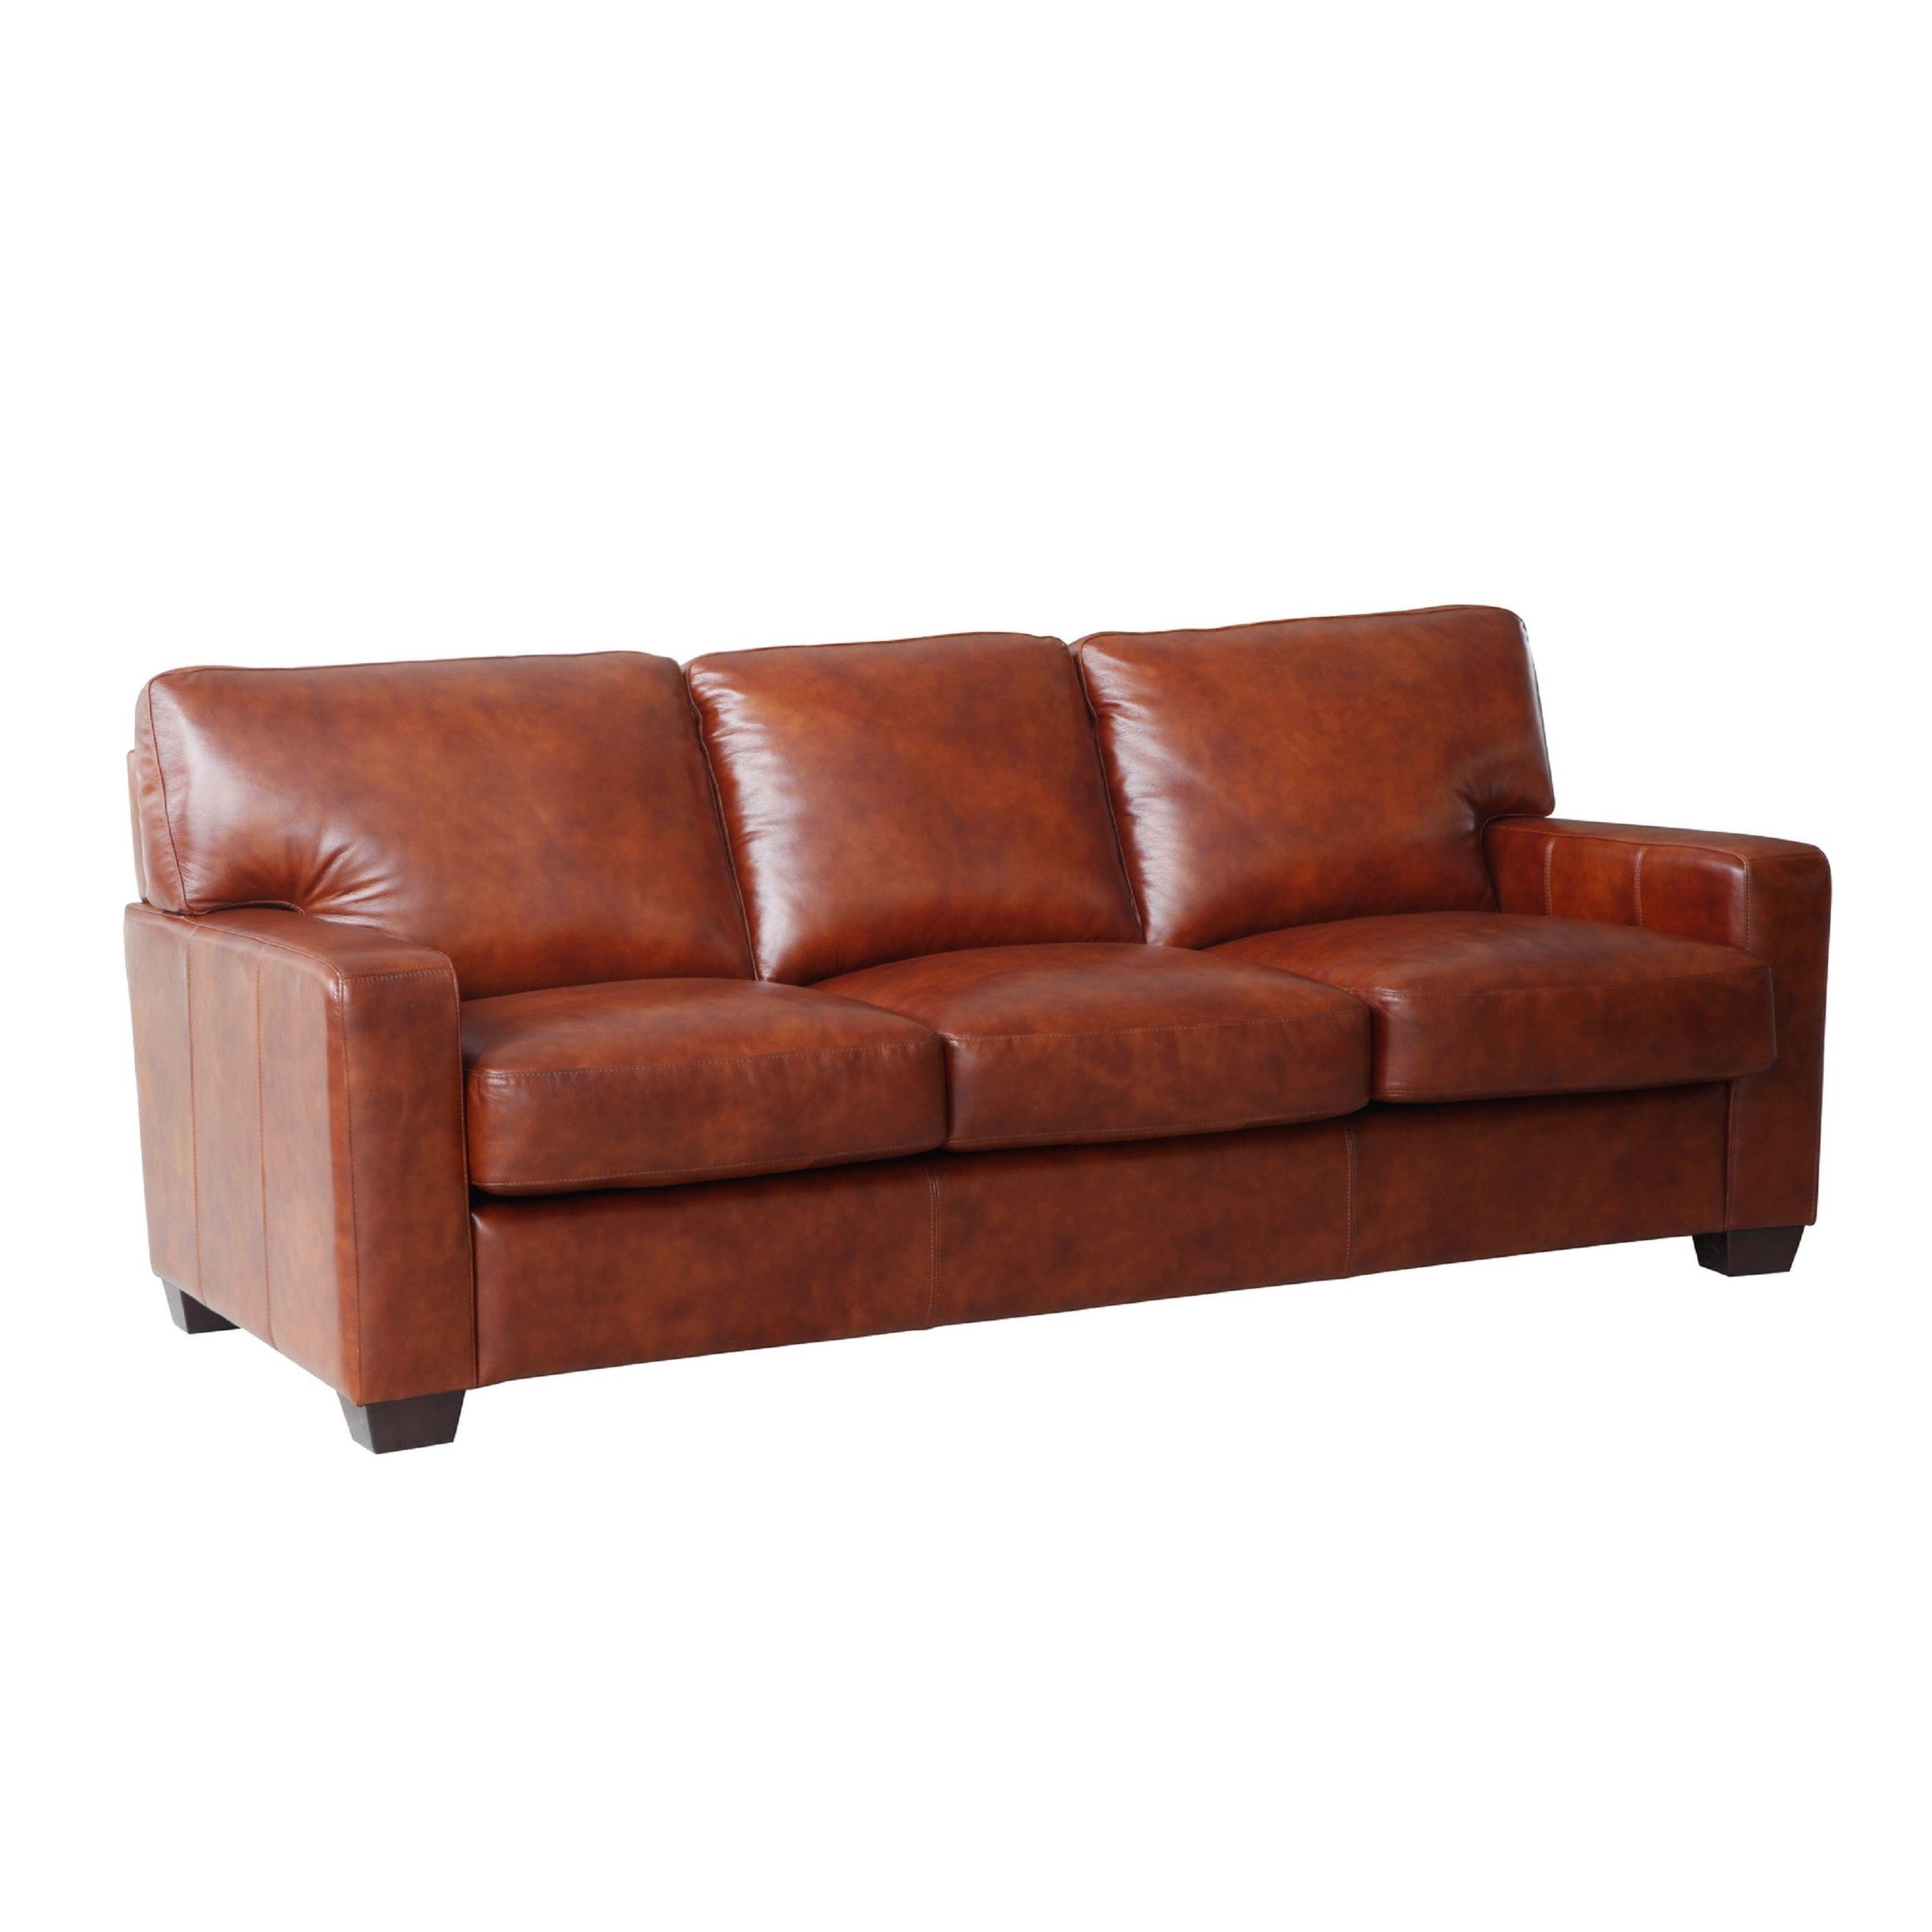 Lazzaro Leather Aberdeen Auburn Sofa Brown Fabric